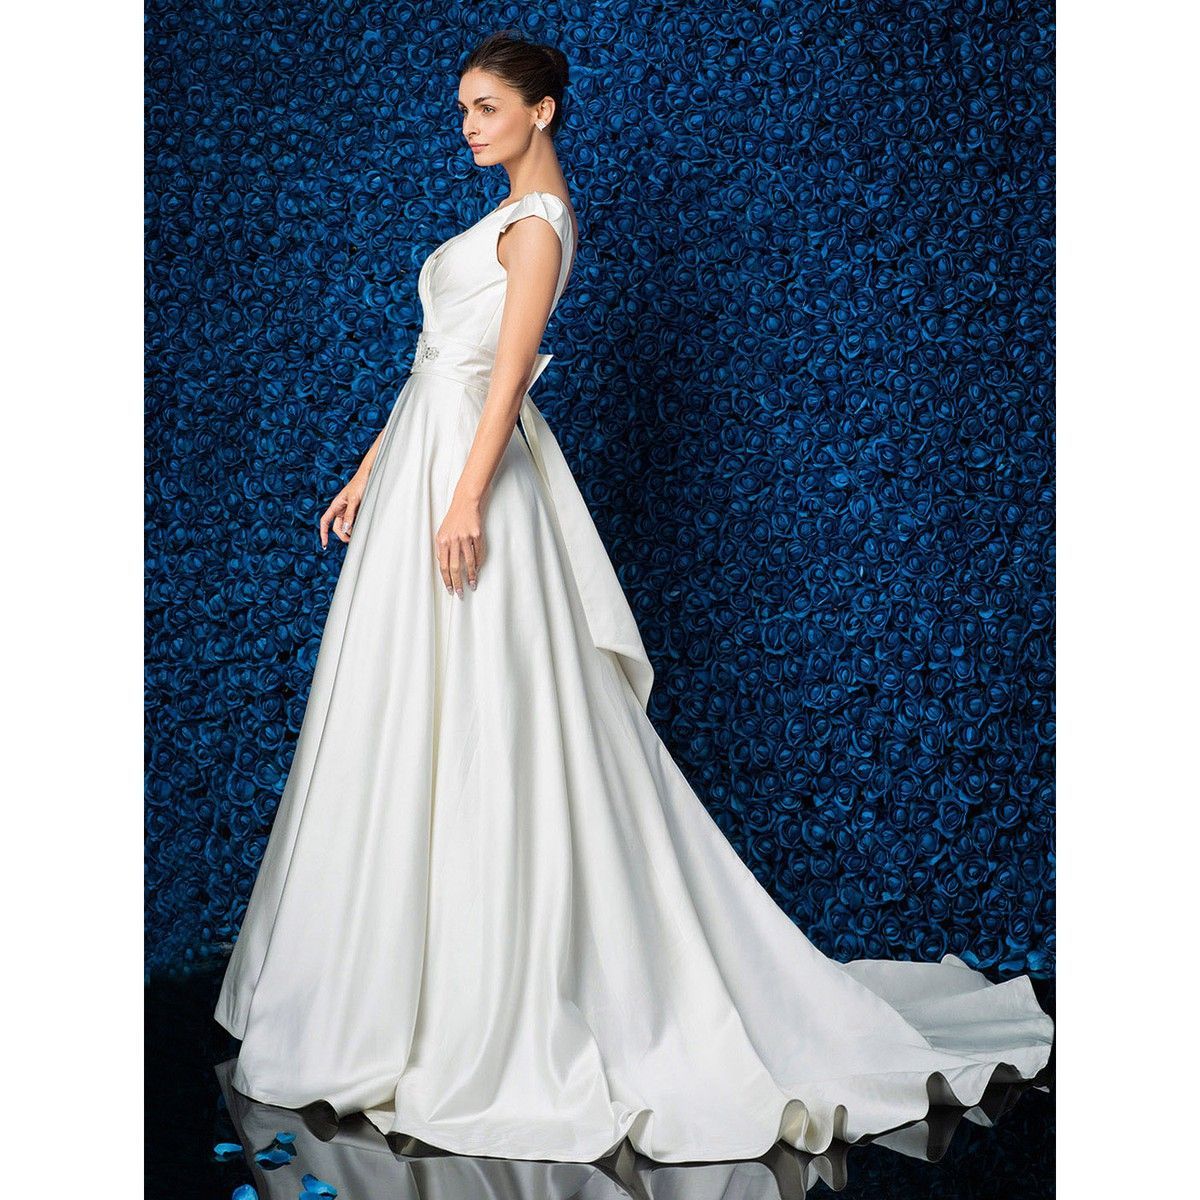 Sheath/Column Vneck Satin Court Train Wedding Dress